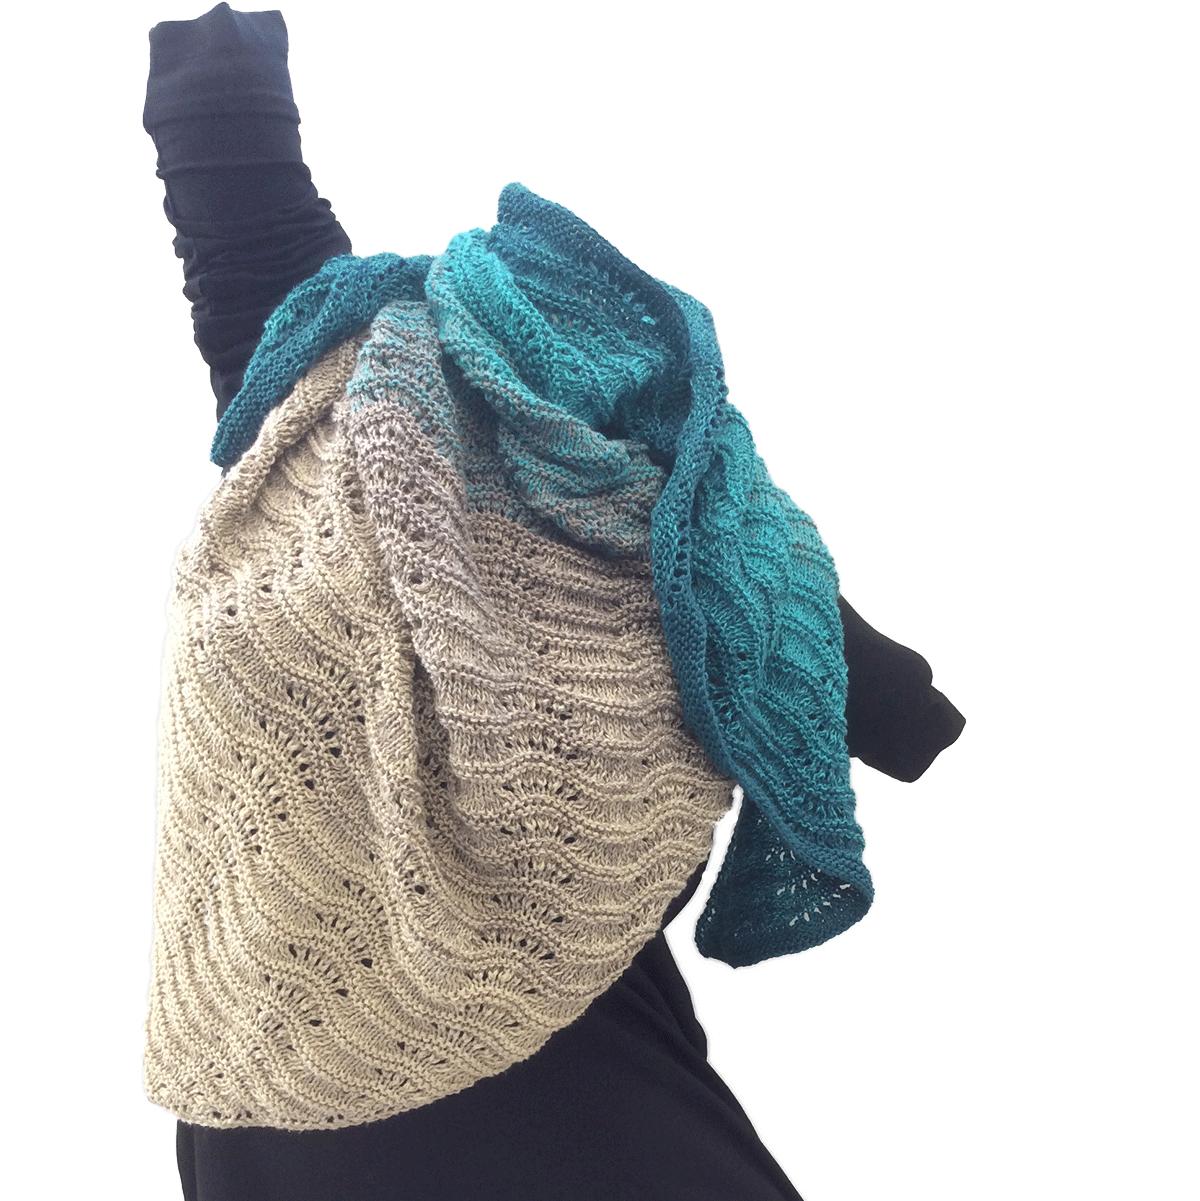 Woolly Hugs Bobbel Cotton Farbverlaufsgarn Von Veronika Hug